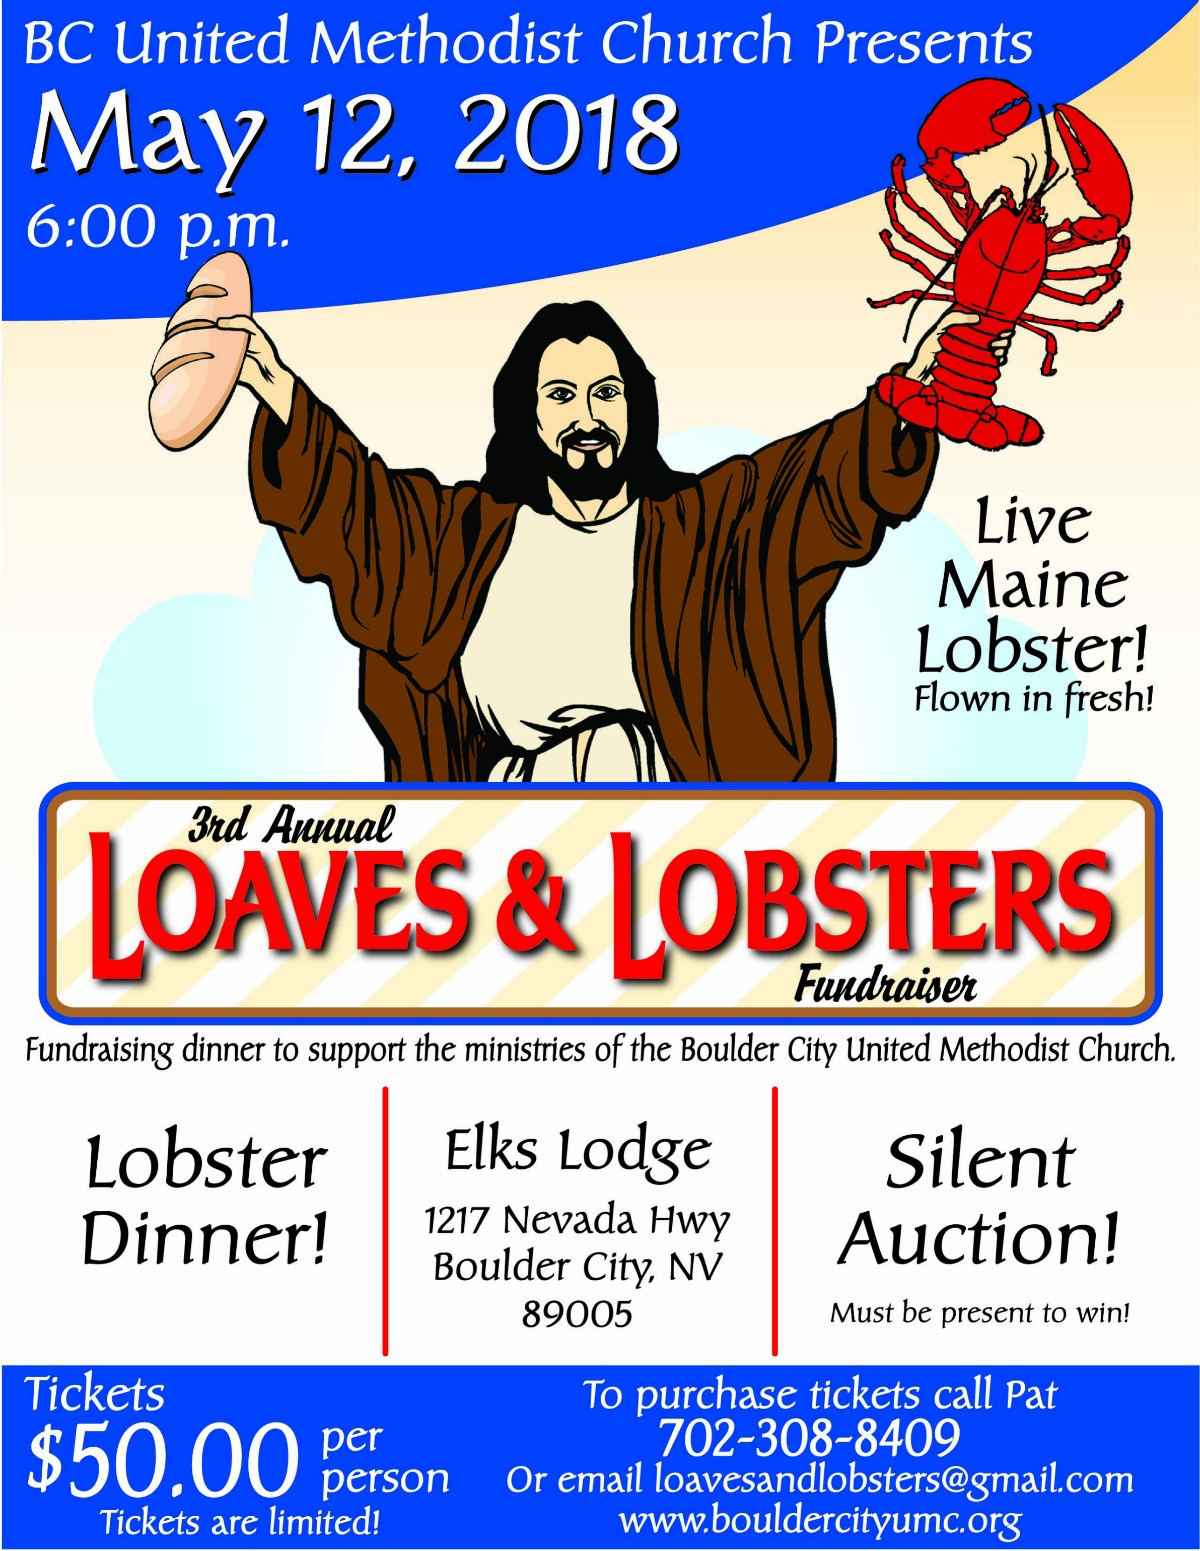 Lobster Poster BCUMC Boulder City, NV